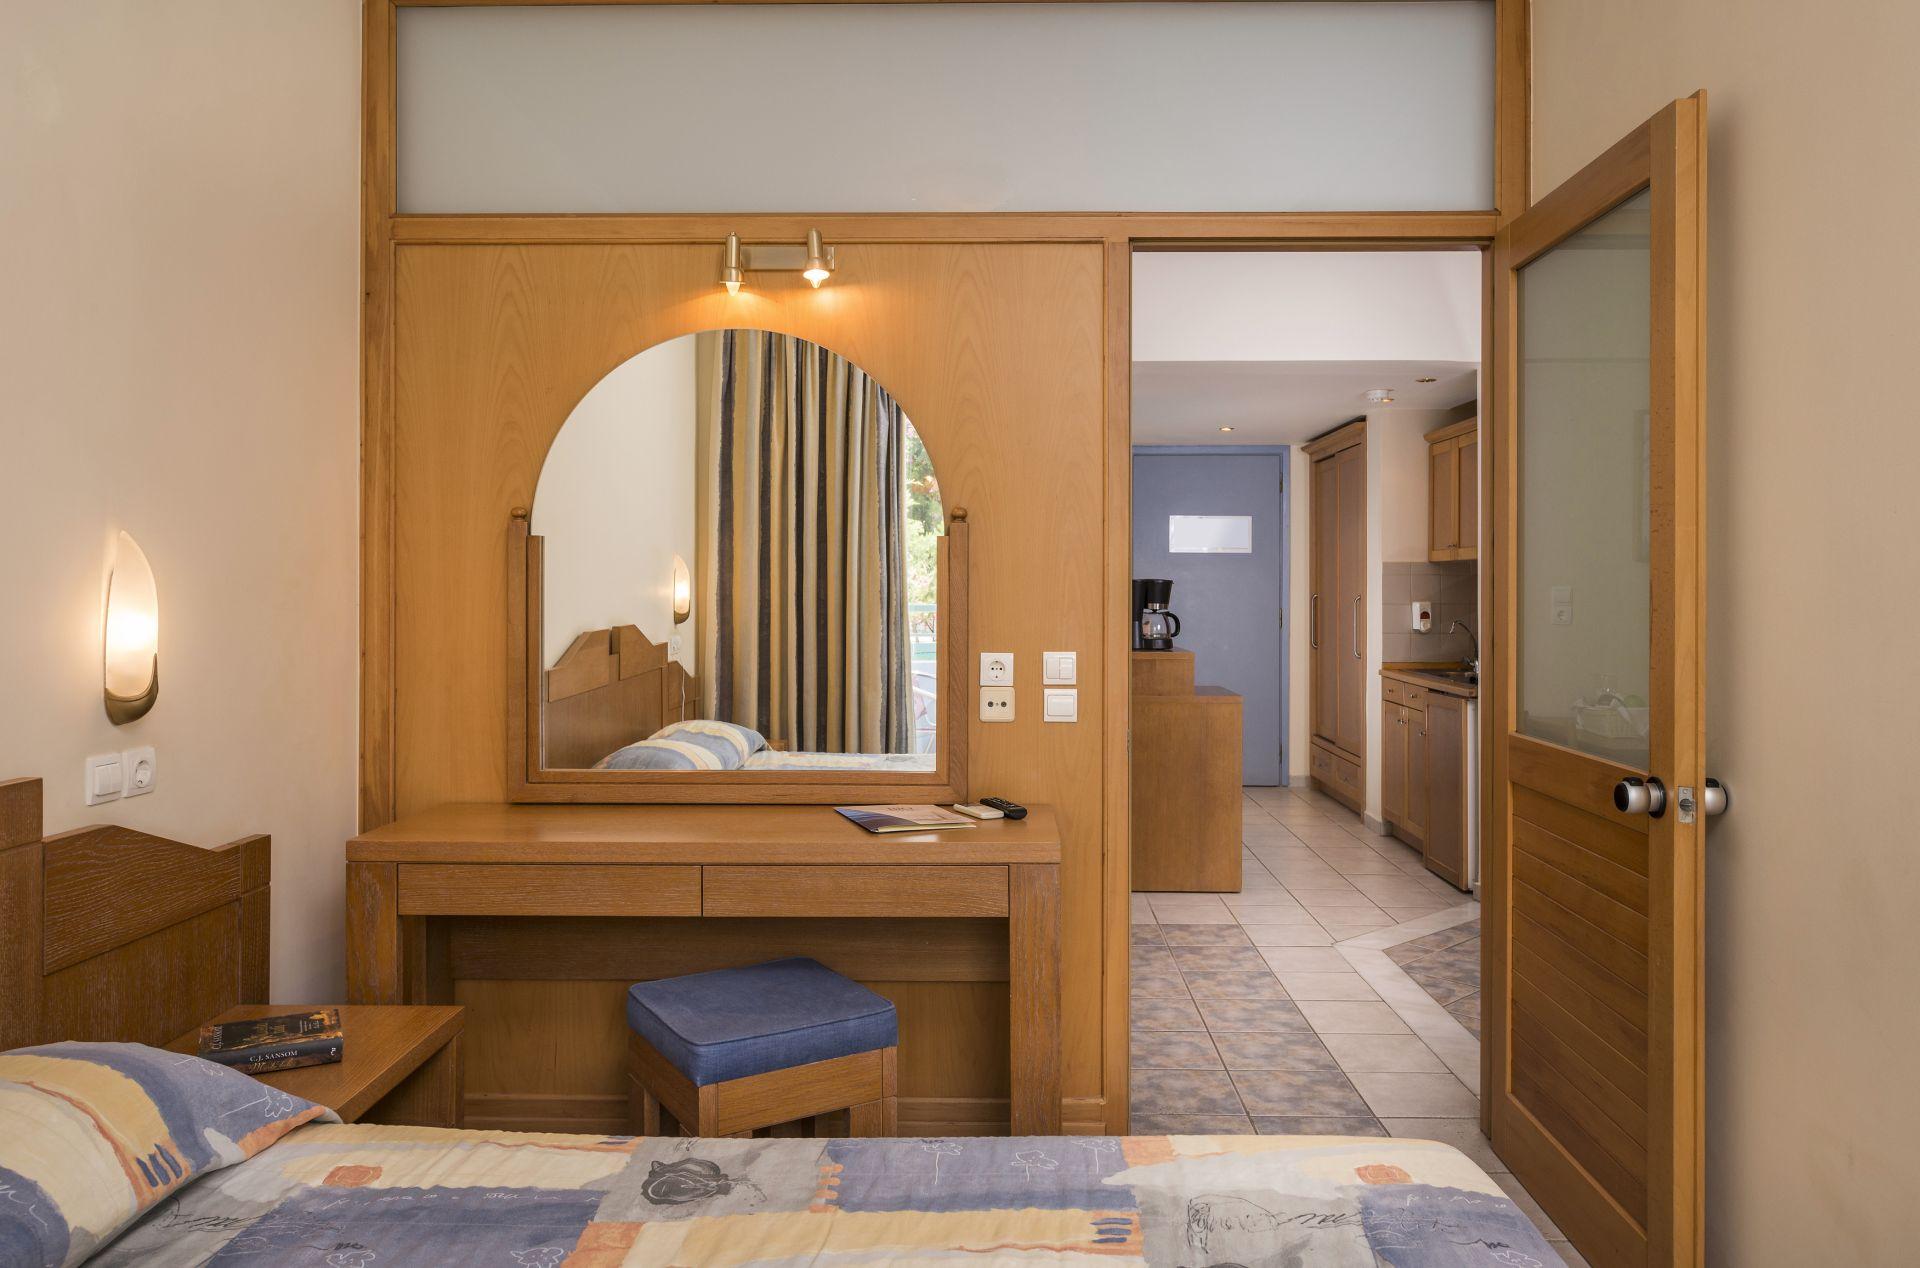 Two-Bedroom Apartment - BIO Suites Hotel in Rethymnon, Crete